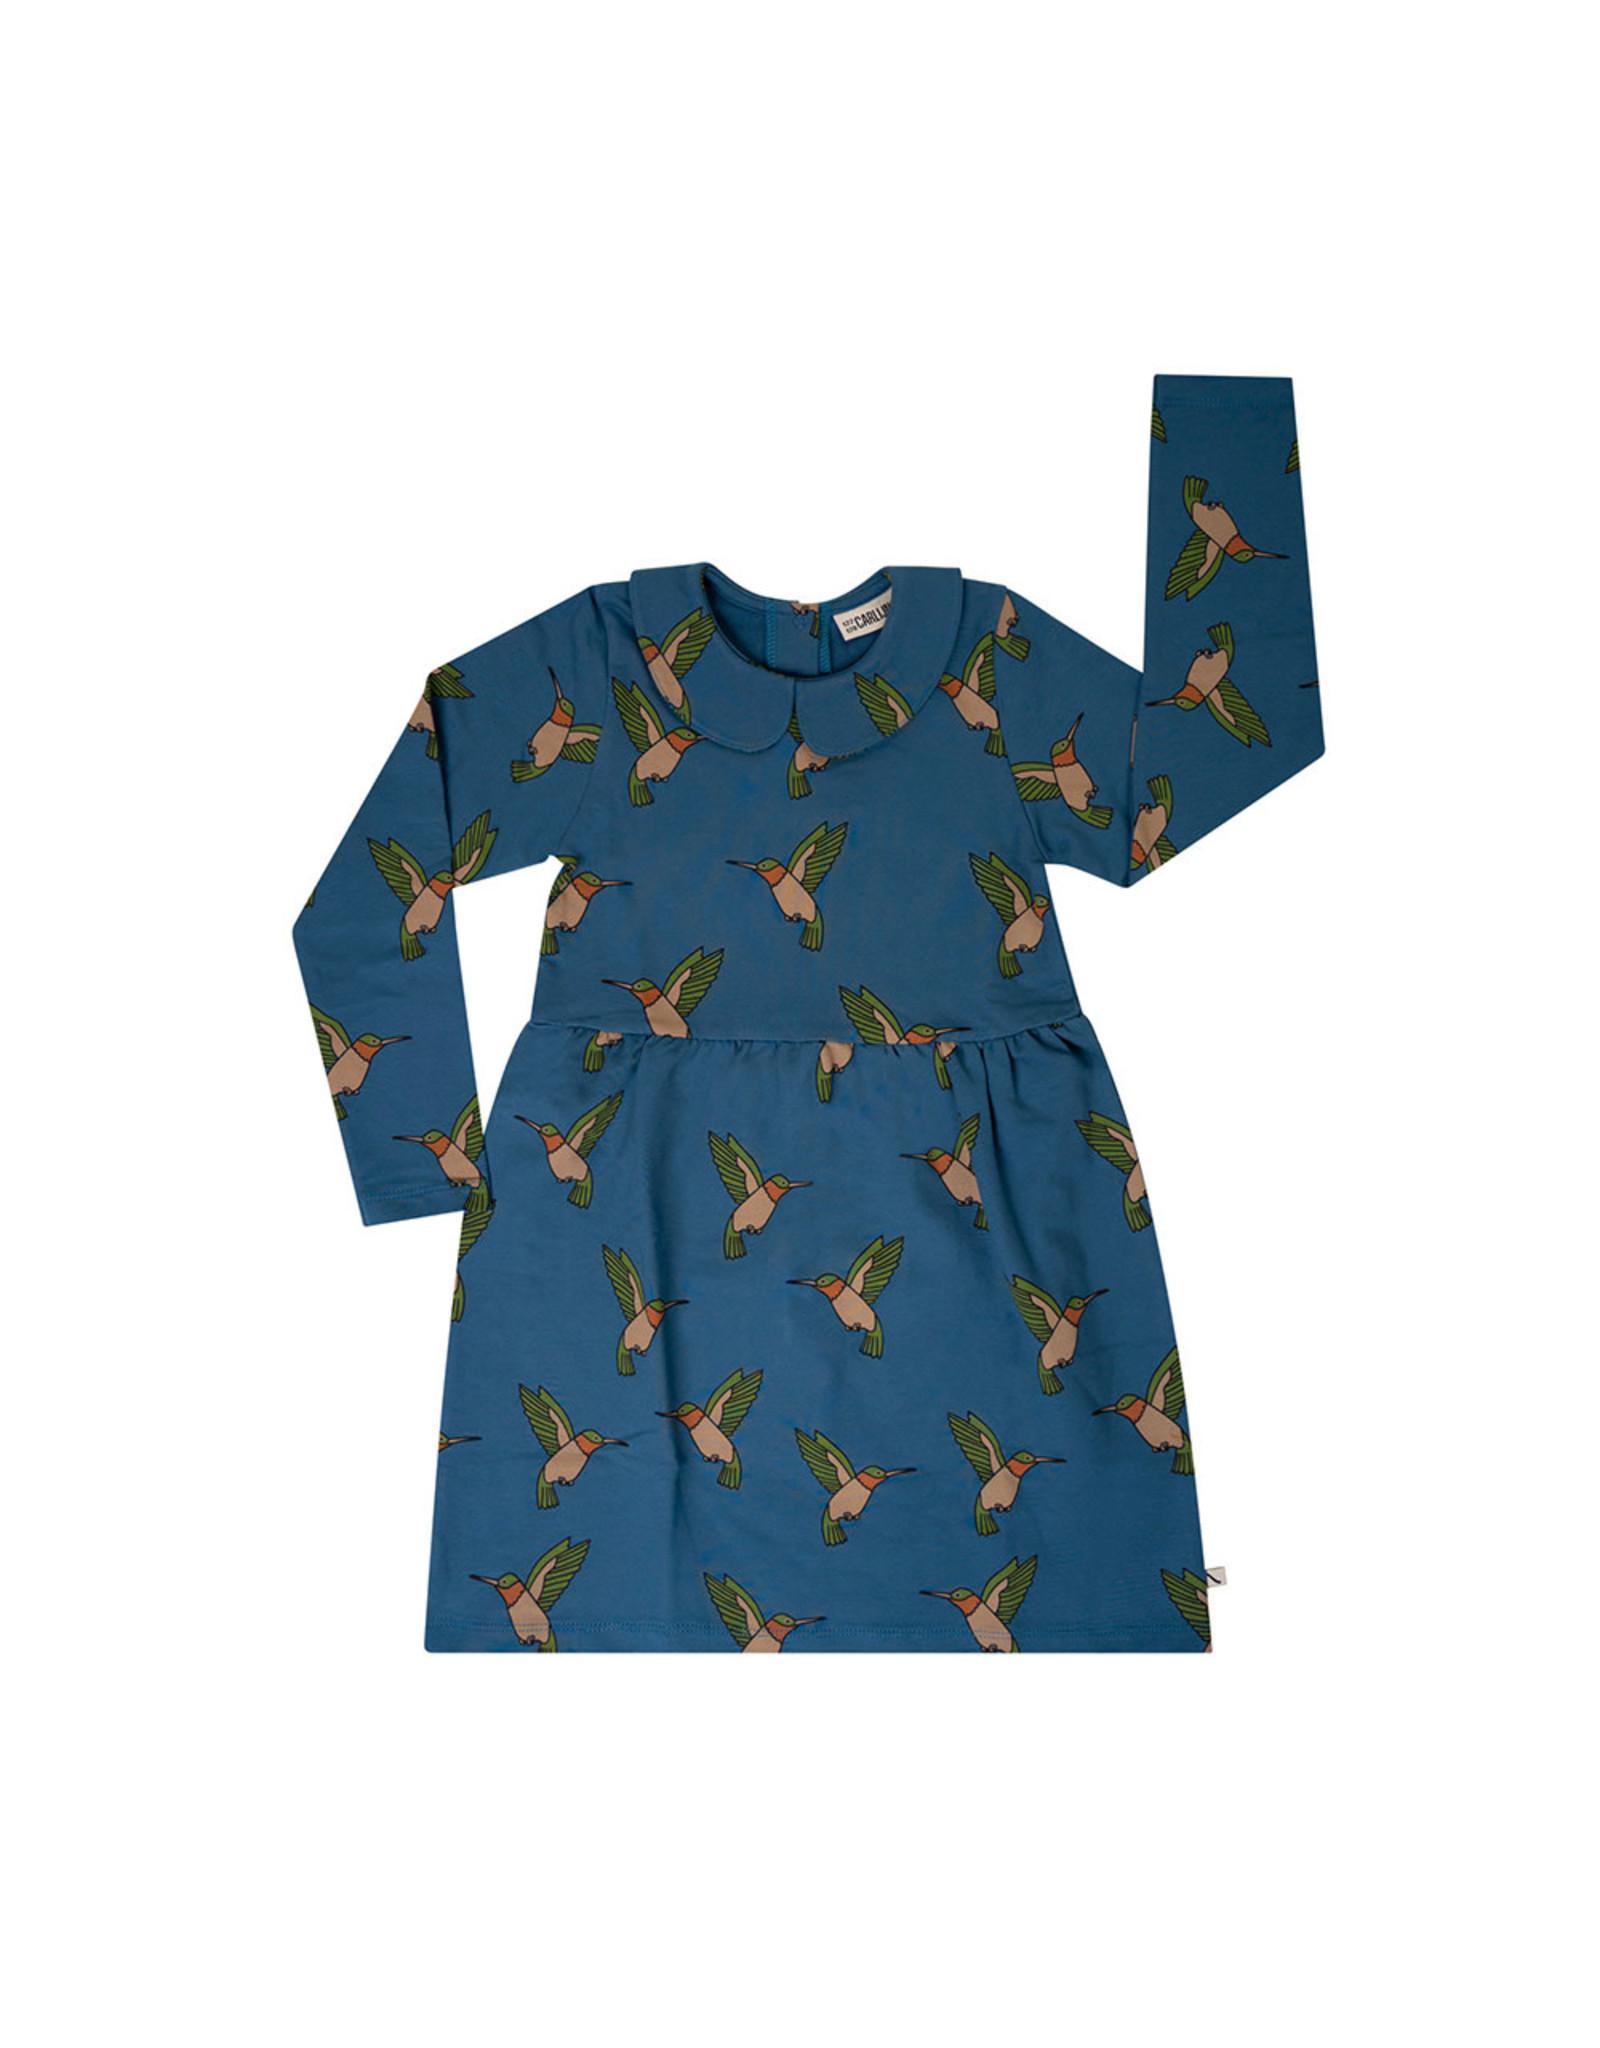 Carlijn Q Carlijn Q Hummingbird - Collar Dress